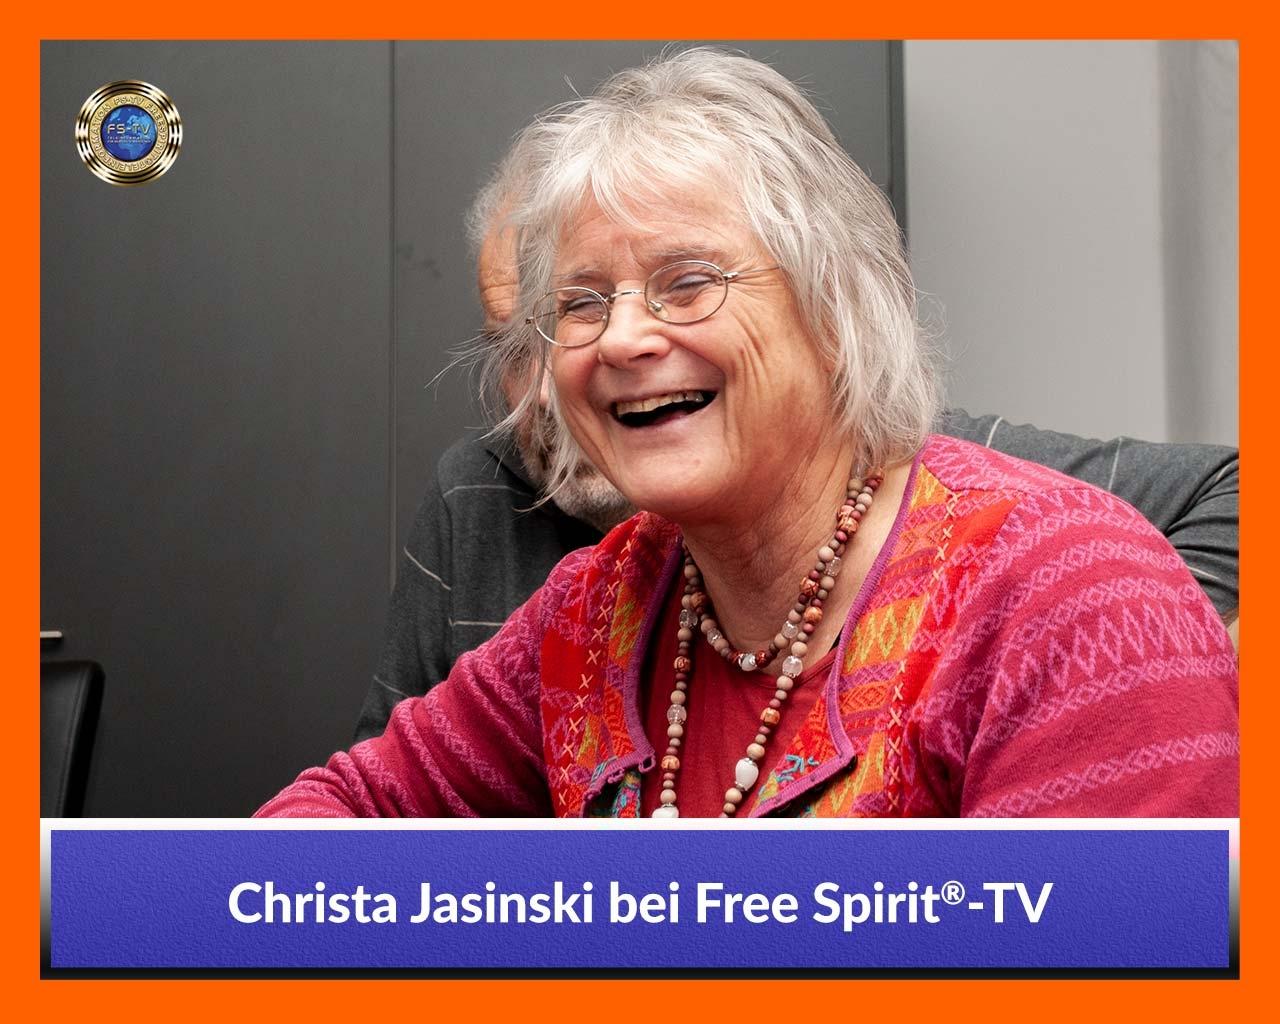 Galleriebild-Christa-Jasinski-04